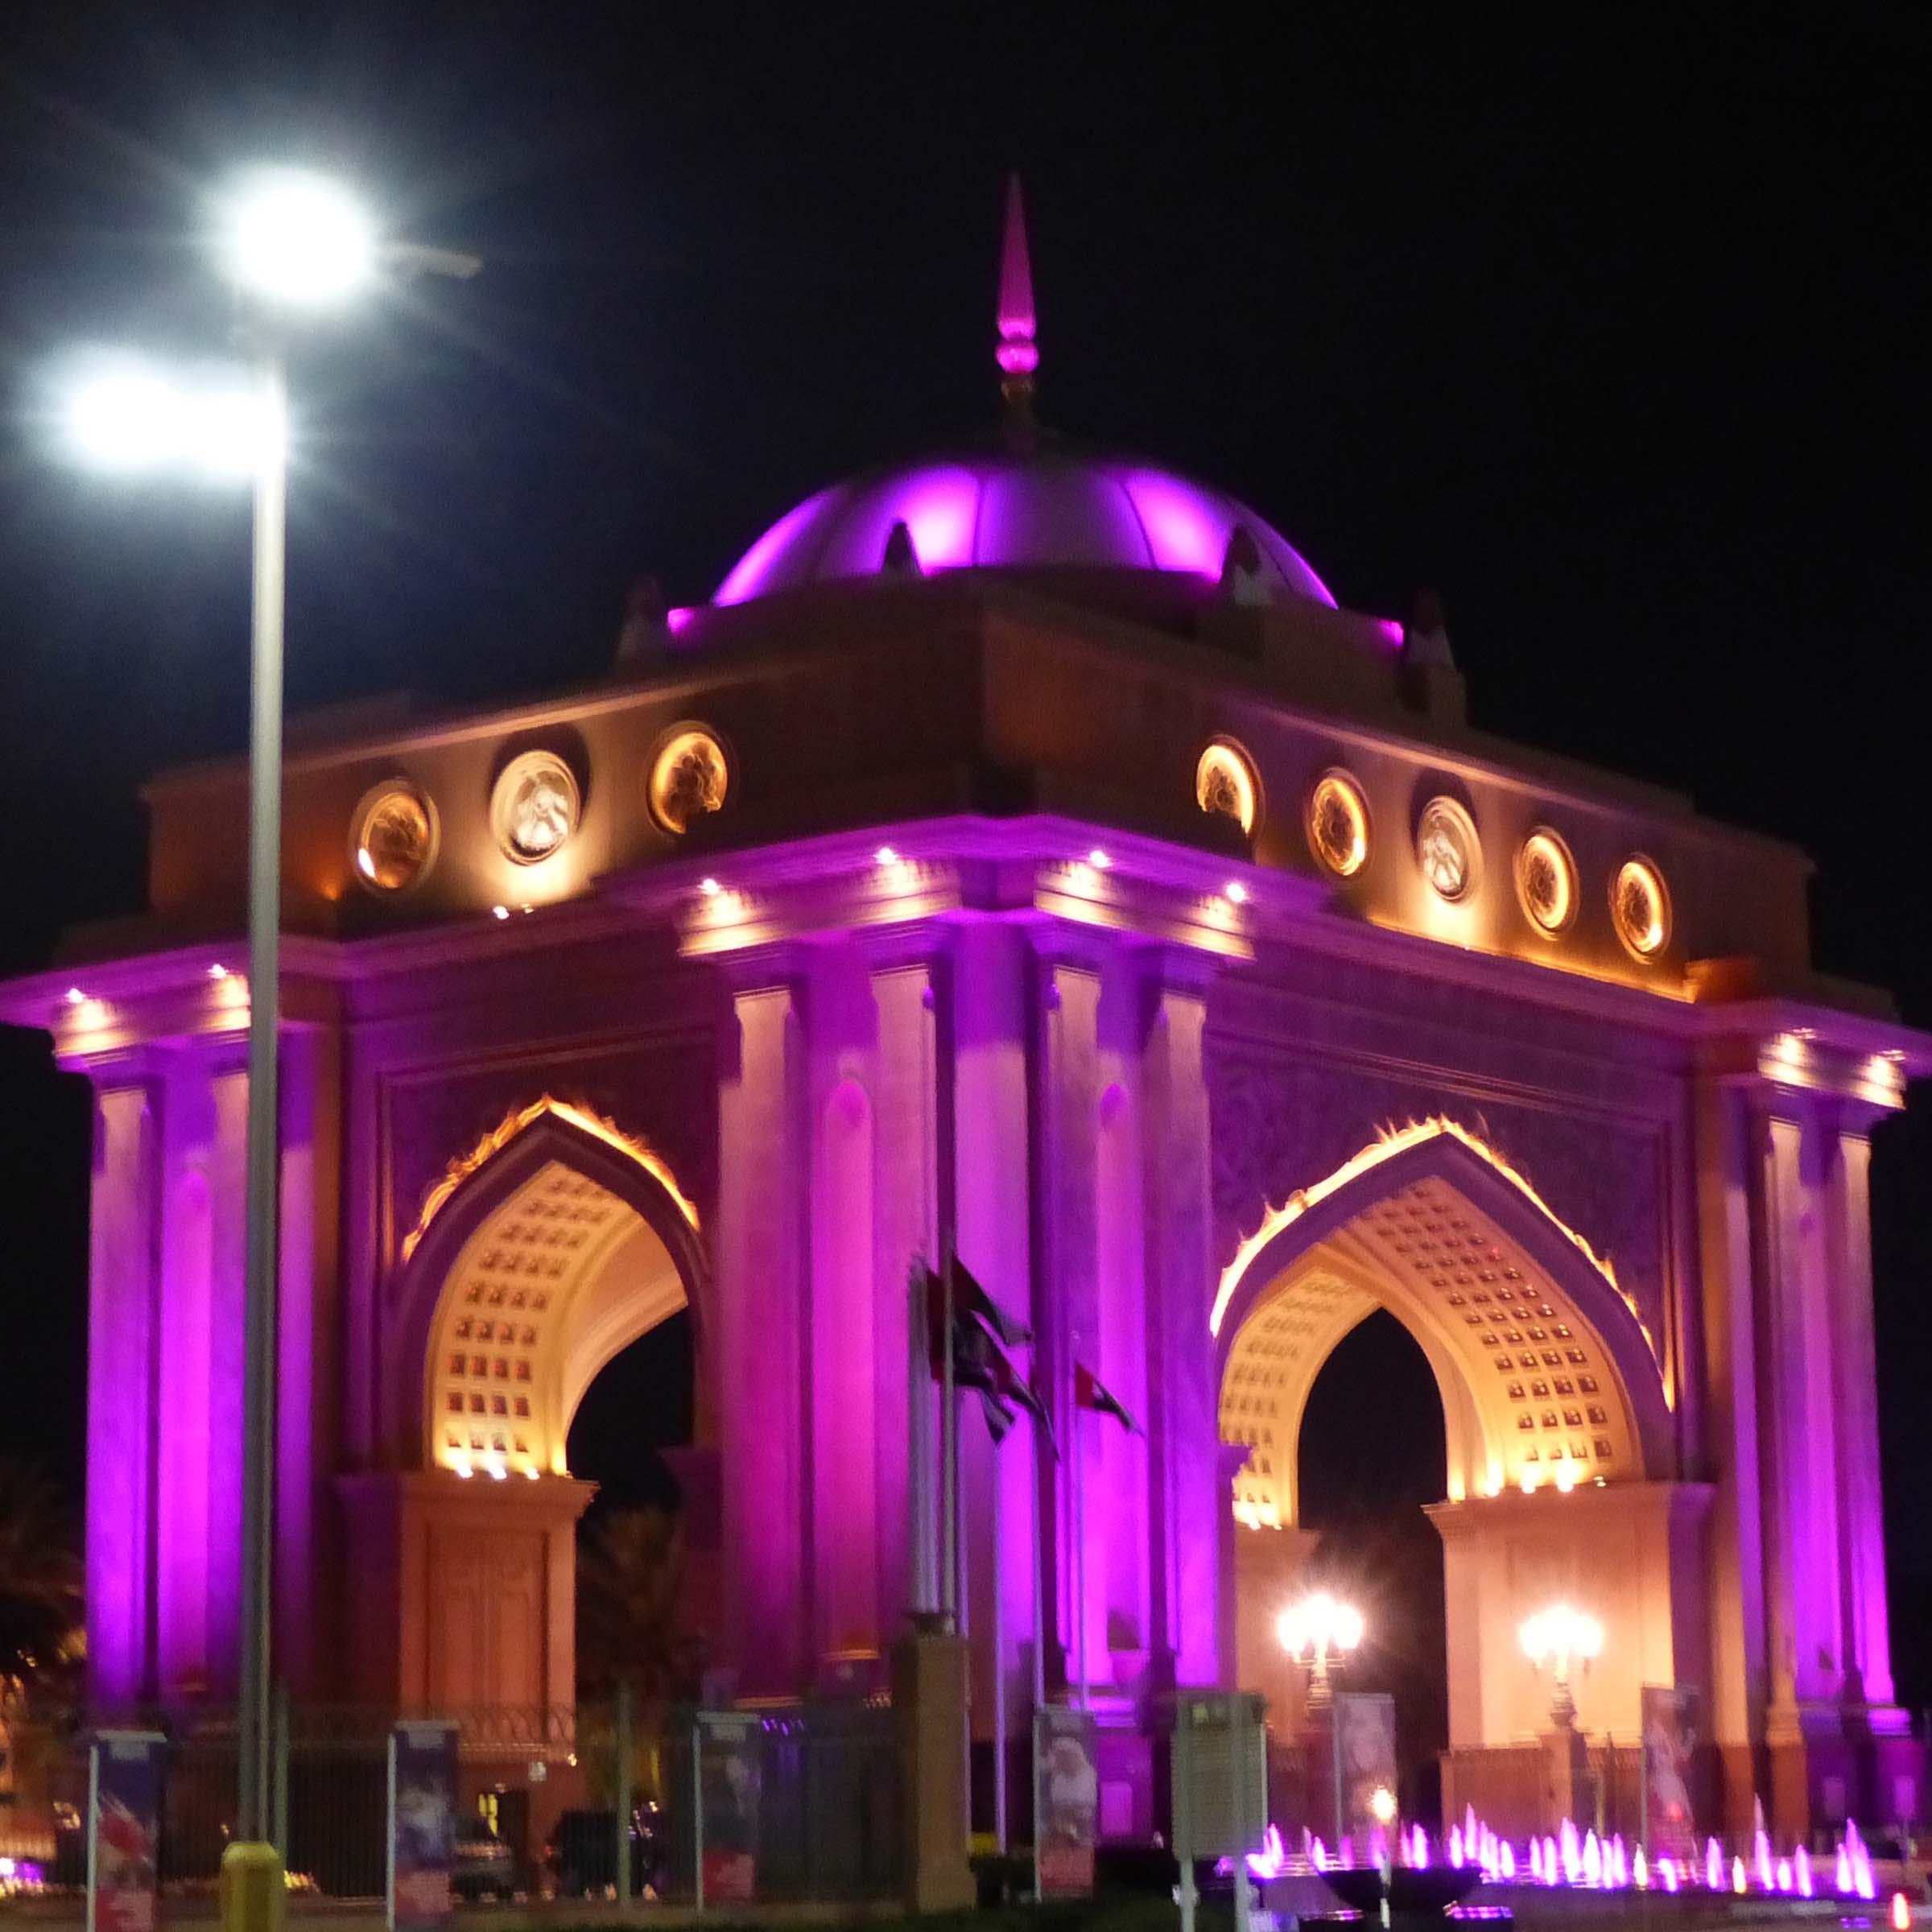 Ornate gatehouse illuminated purple at night